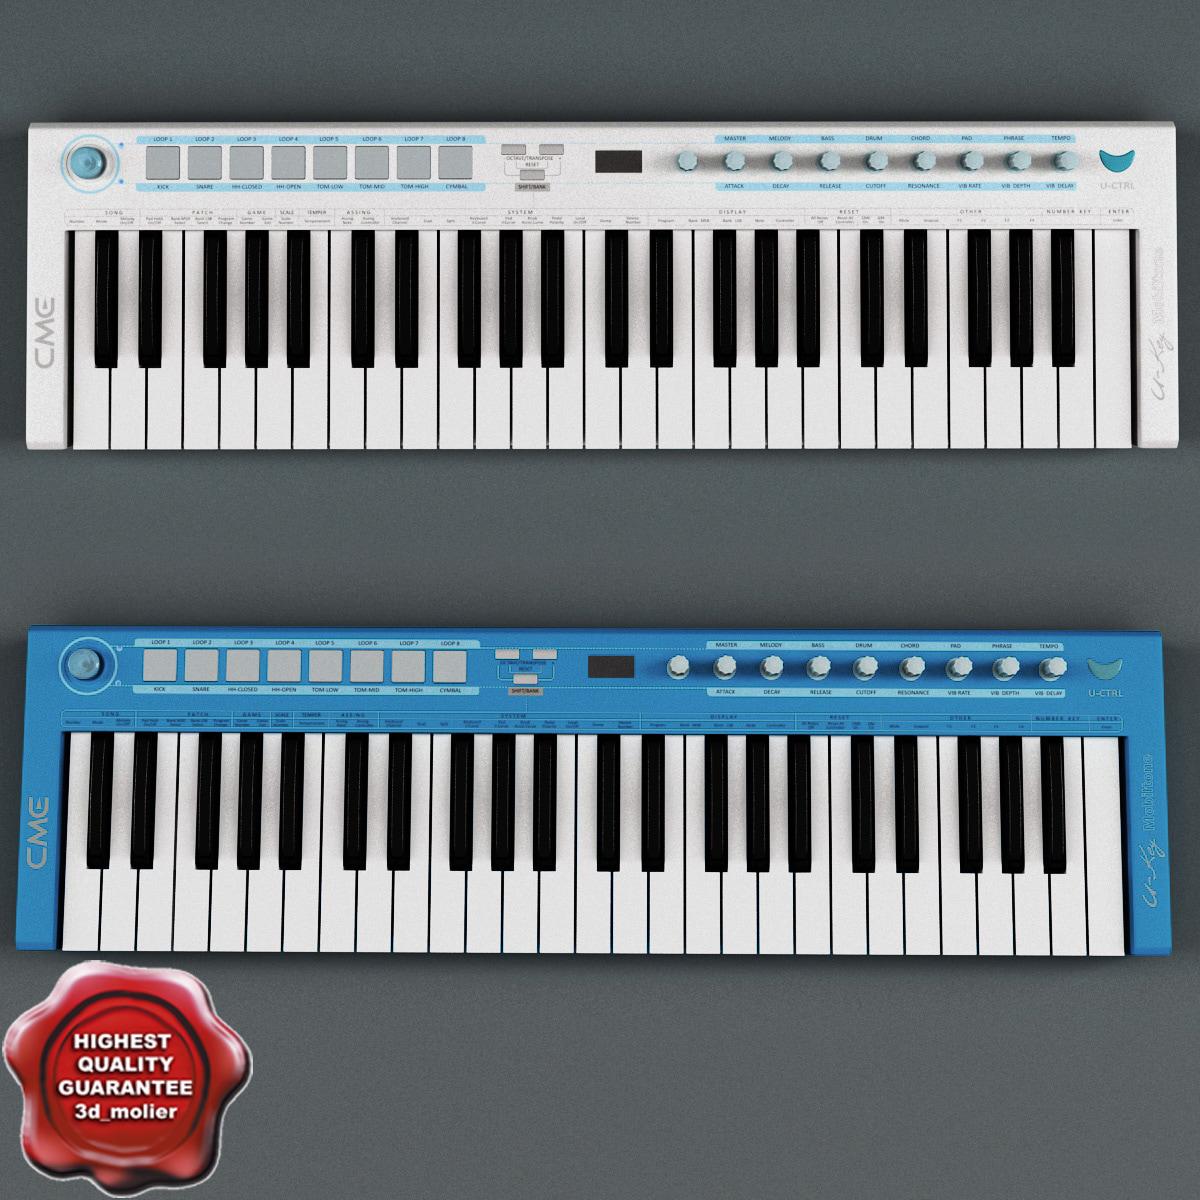 USB_MIDI_Keyboard_U-Key_Collection_00.jpg